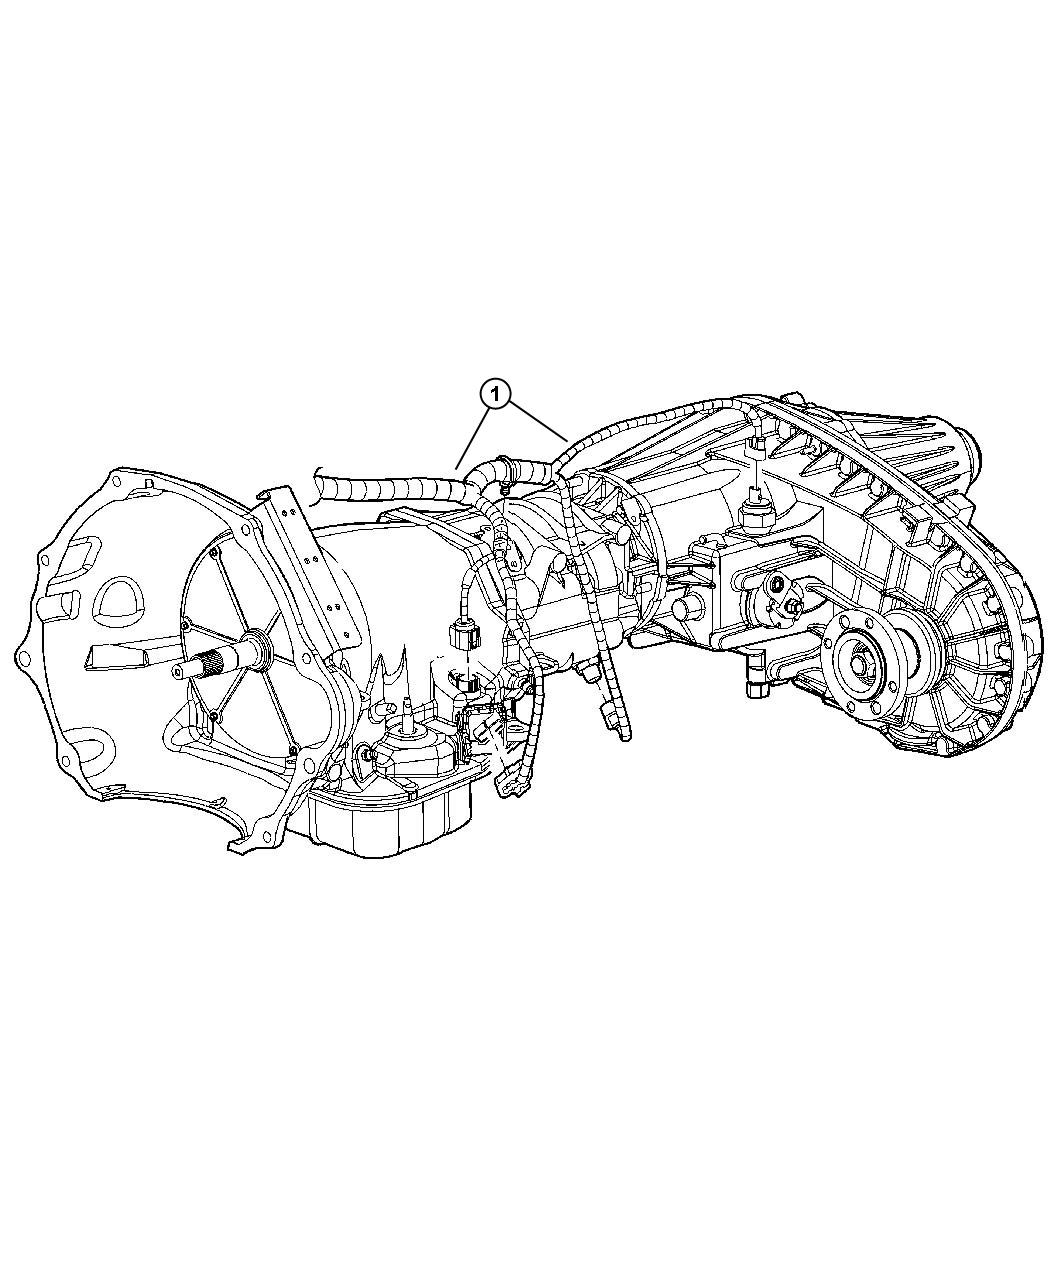 Dodge Ram 3500 Wiring. Transmission. [elec shift-on-the